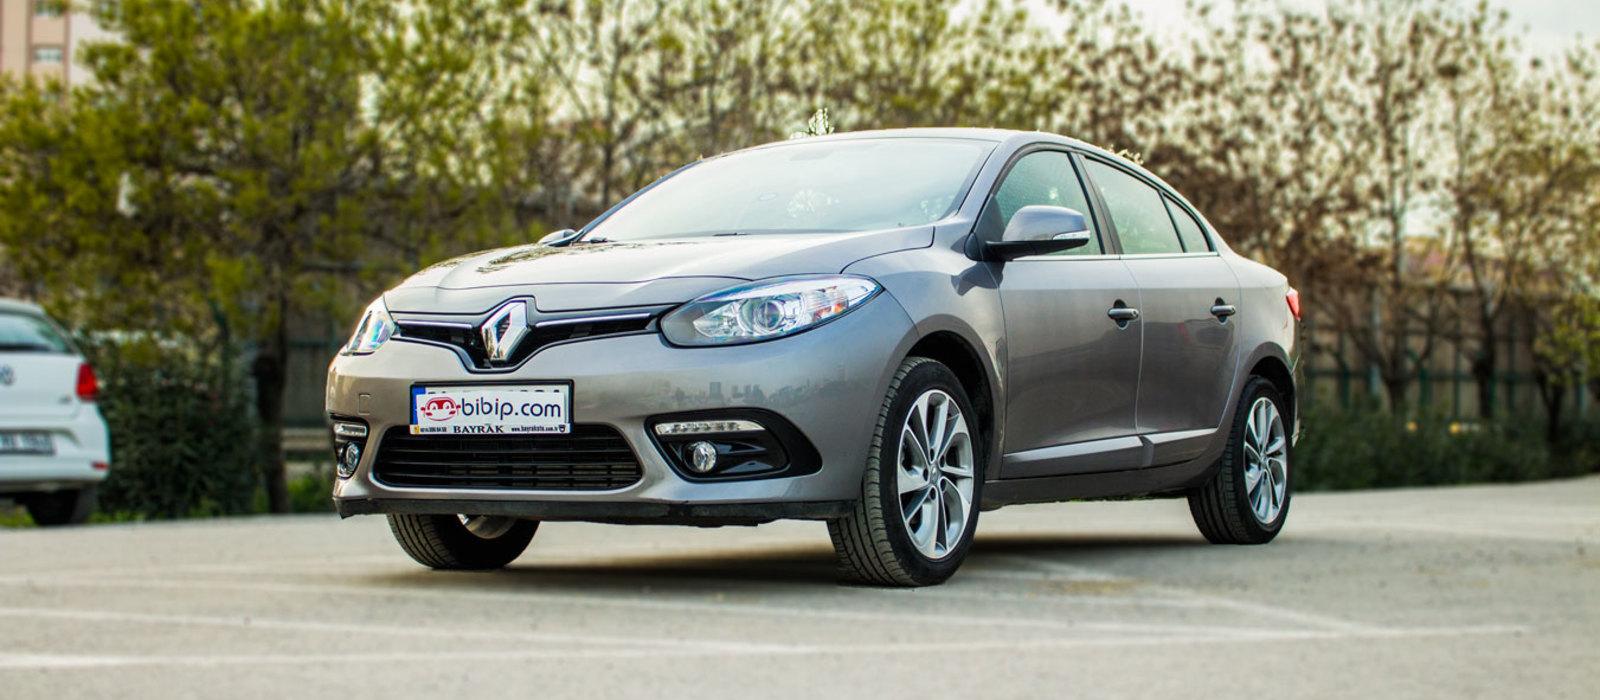 Satılık Ikinci El Renault 15 Dci Icon Fluence 2 El Araba